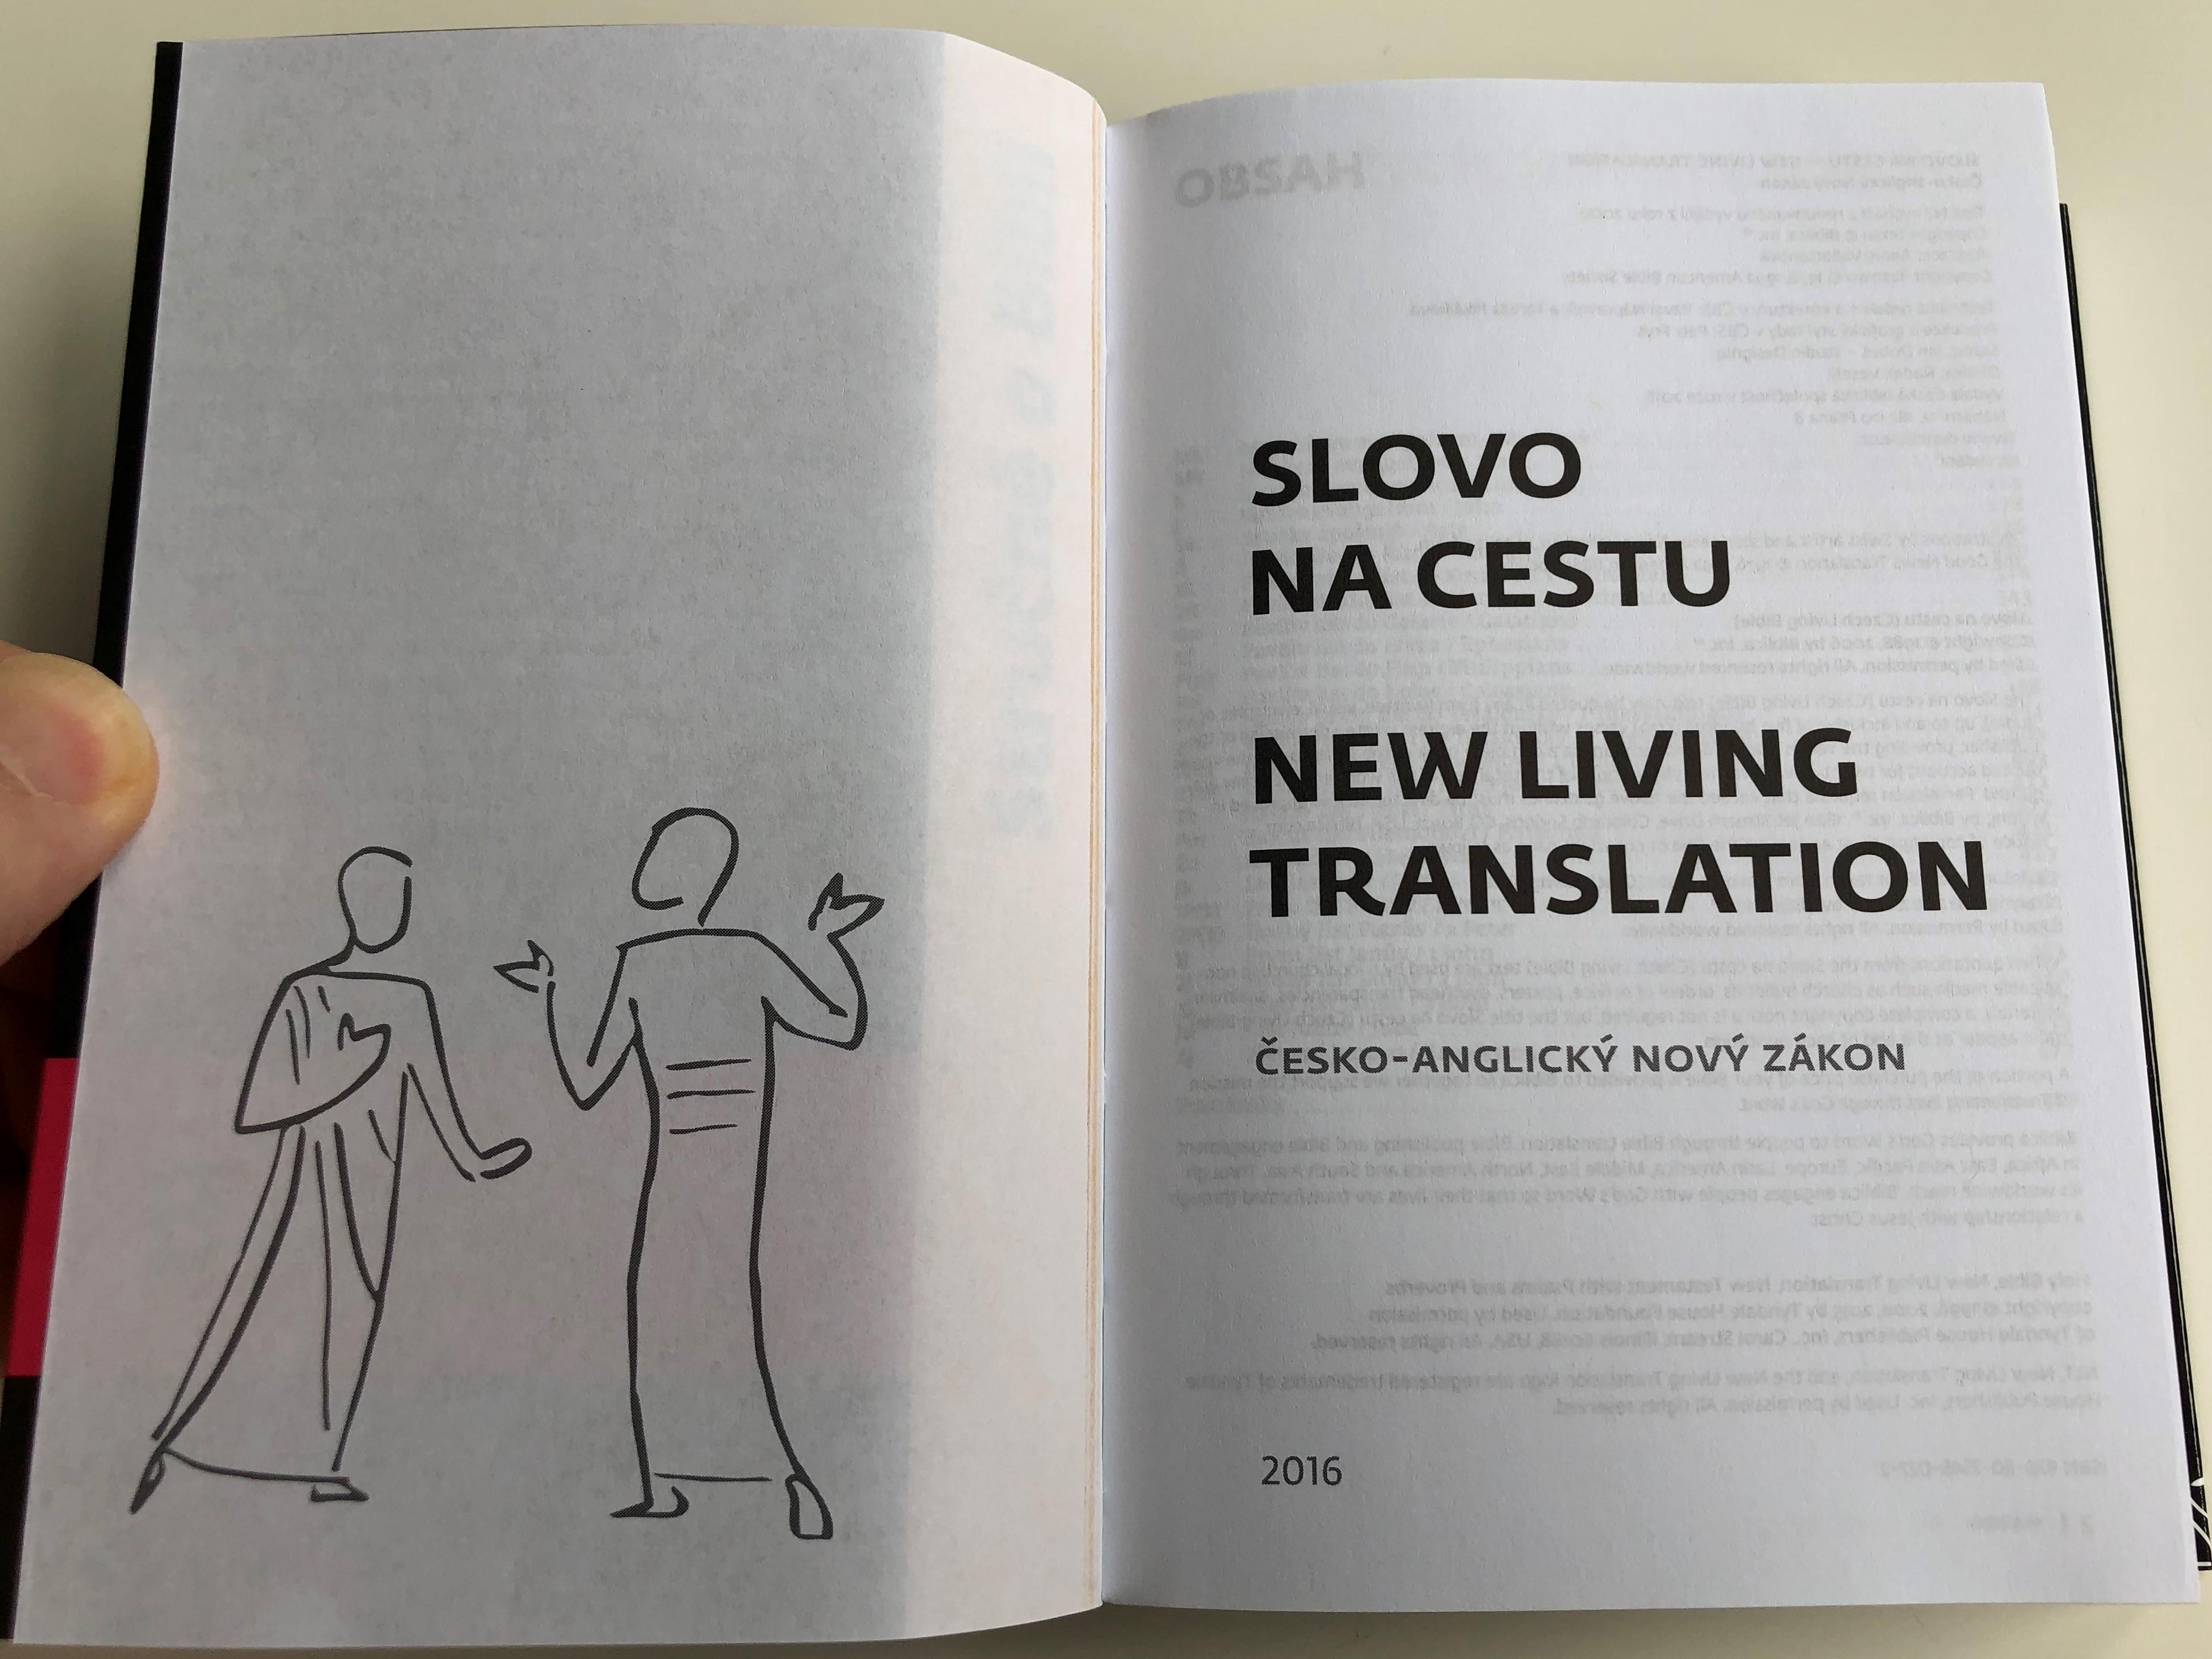 english-czech-bilingual-nt-nov-z-kon-slovo-na-cestu-new-testament-new-living-translation-nlt-6.jpg